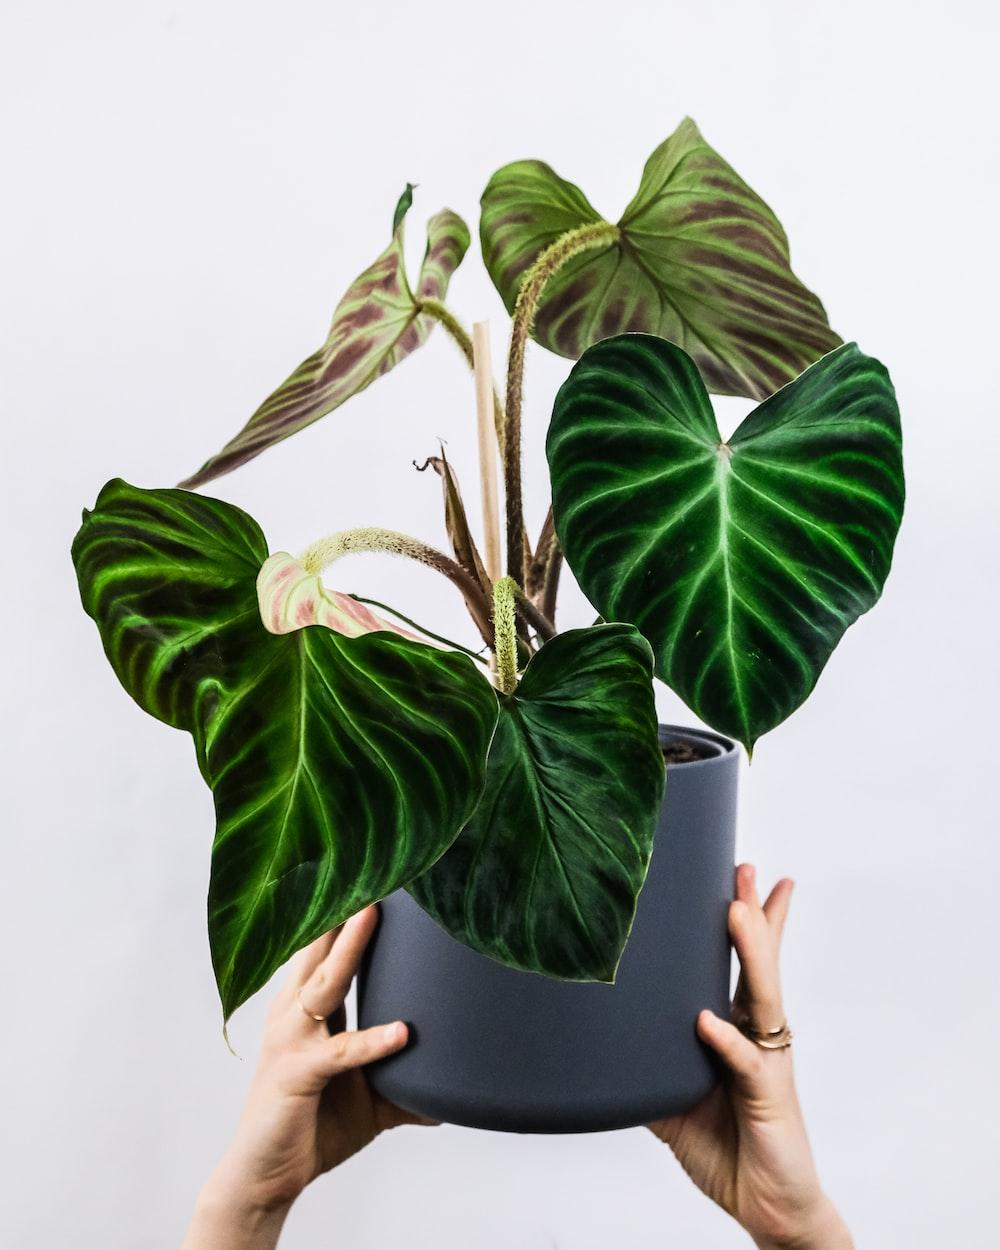 green leaves on black pot